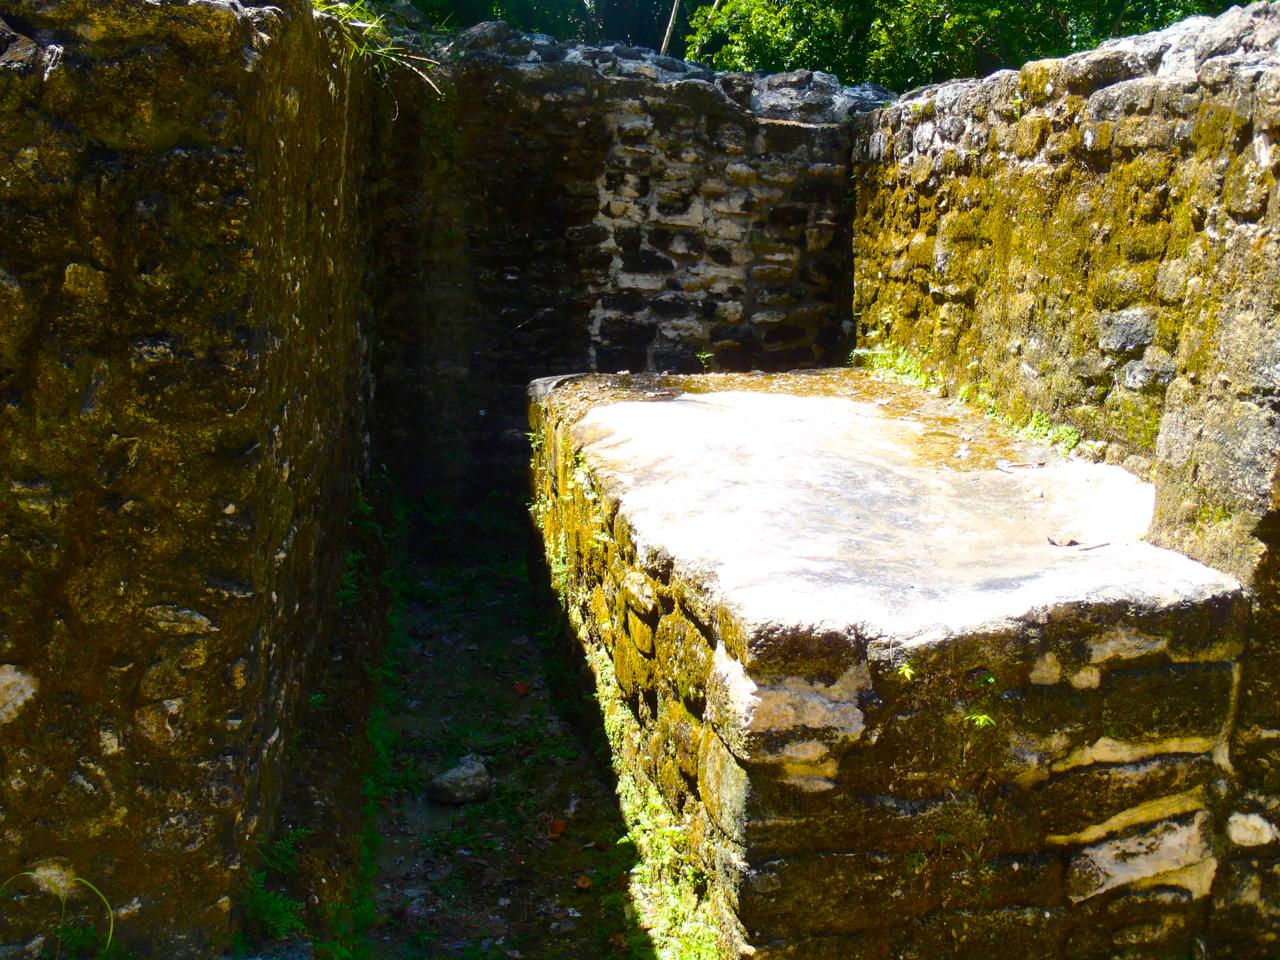 Belize Mainland Tour Lamani Pictures - 19 of 64